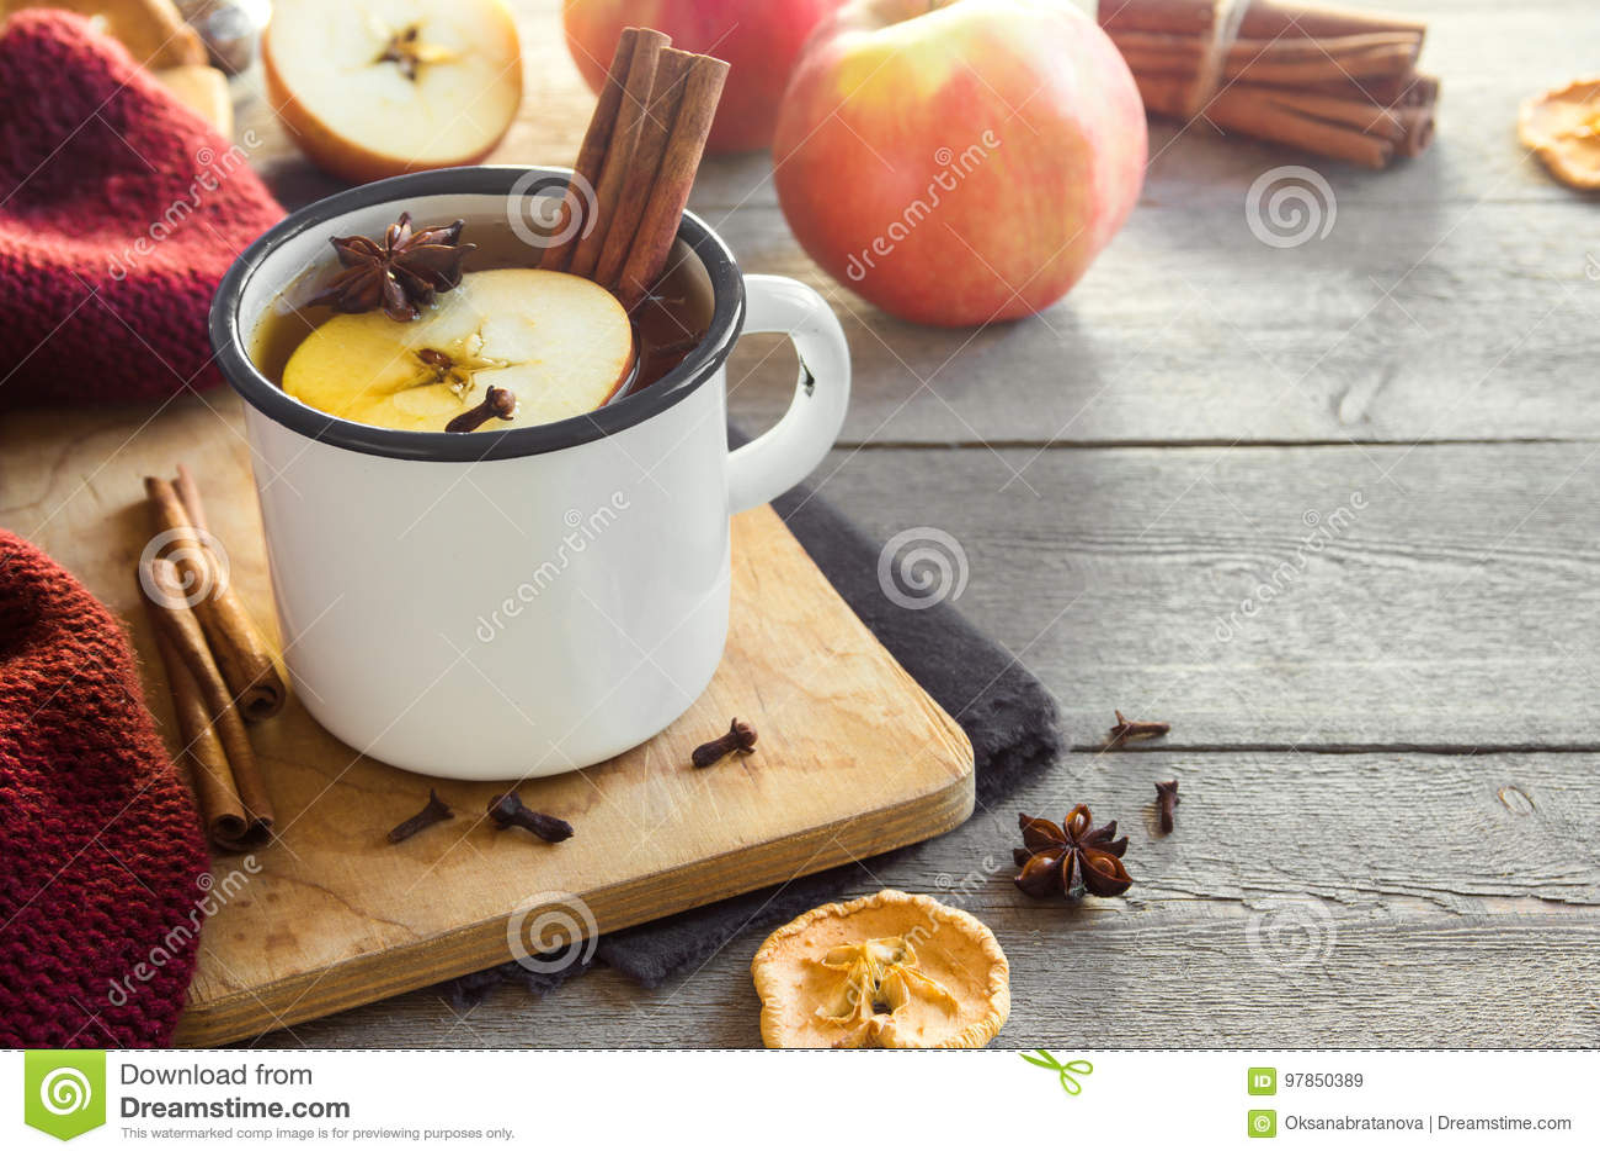 Heißes Getränk mit Äpfeln